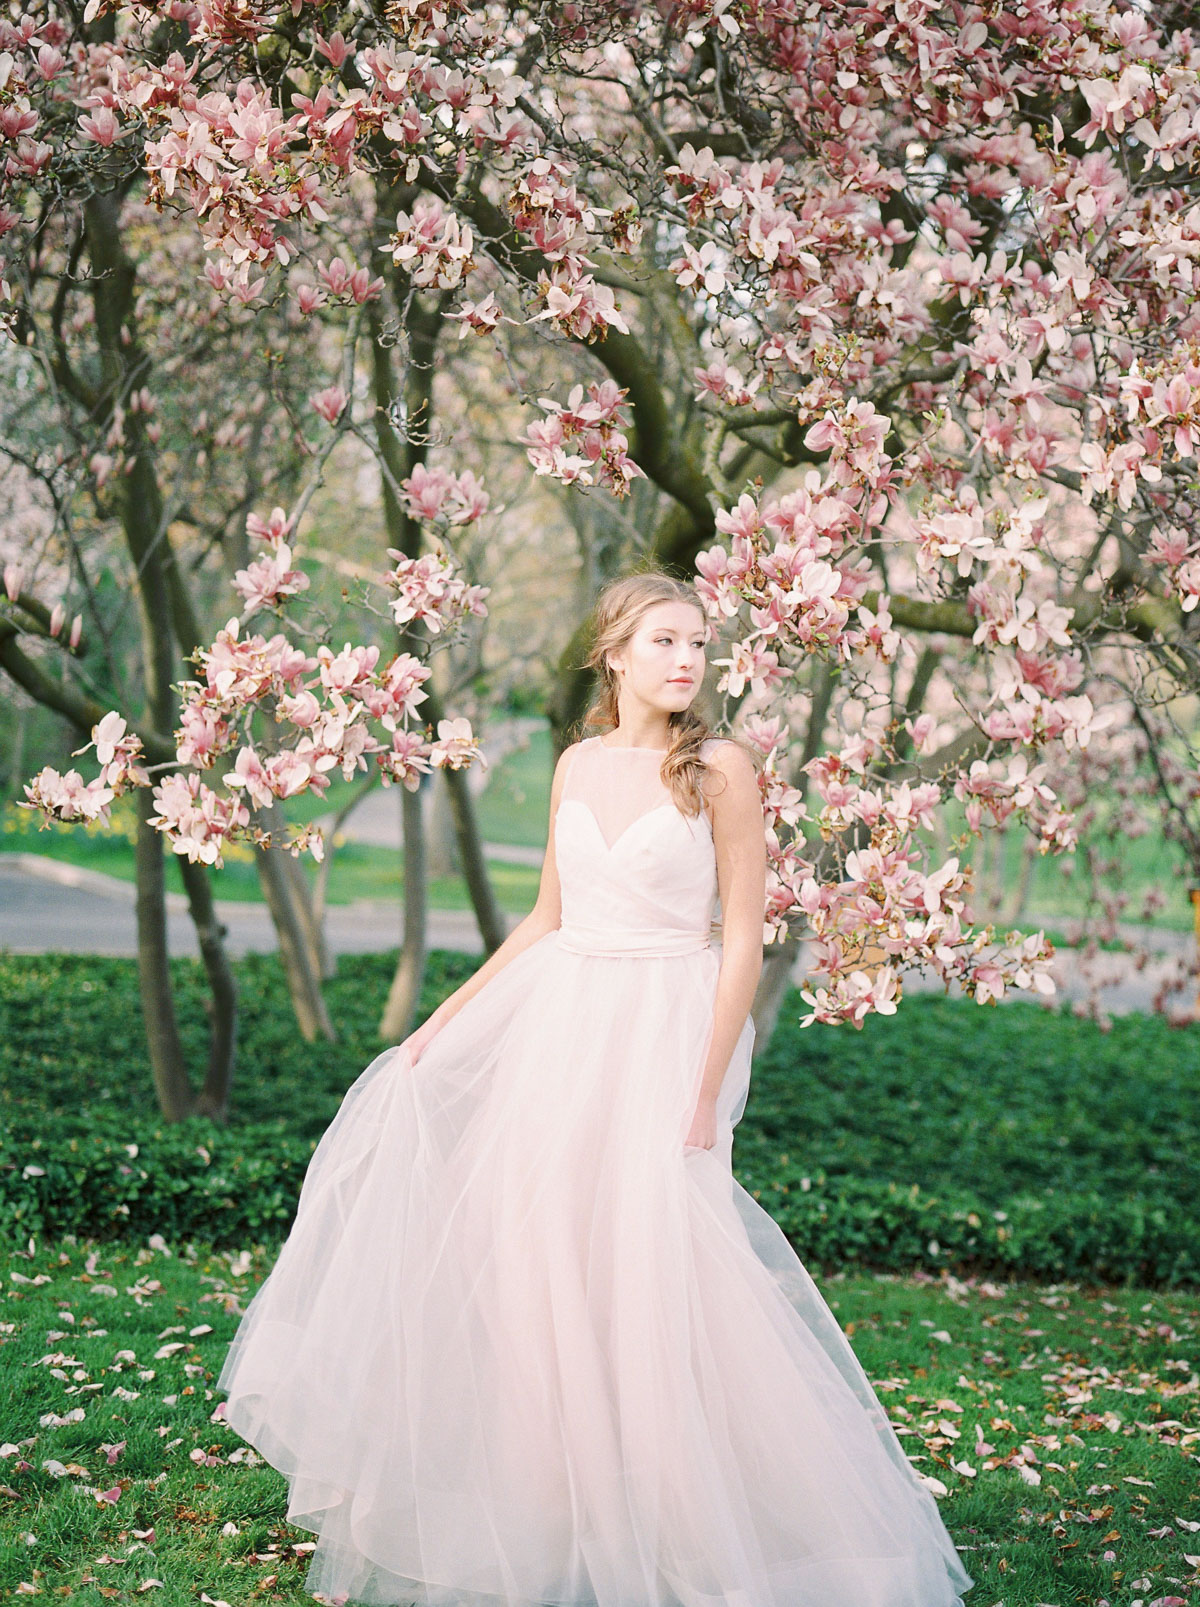 julia-park-photography-vineyard-bride-swish-list-niagara-on-the-lake-wedding-editorial-5.jpg